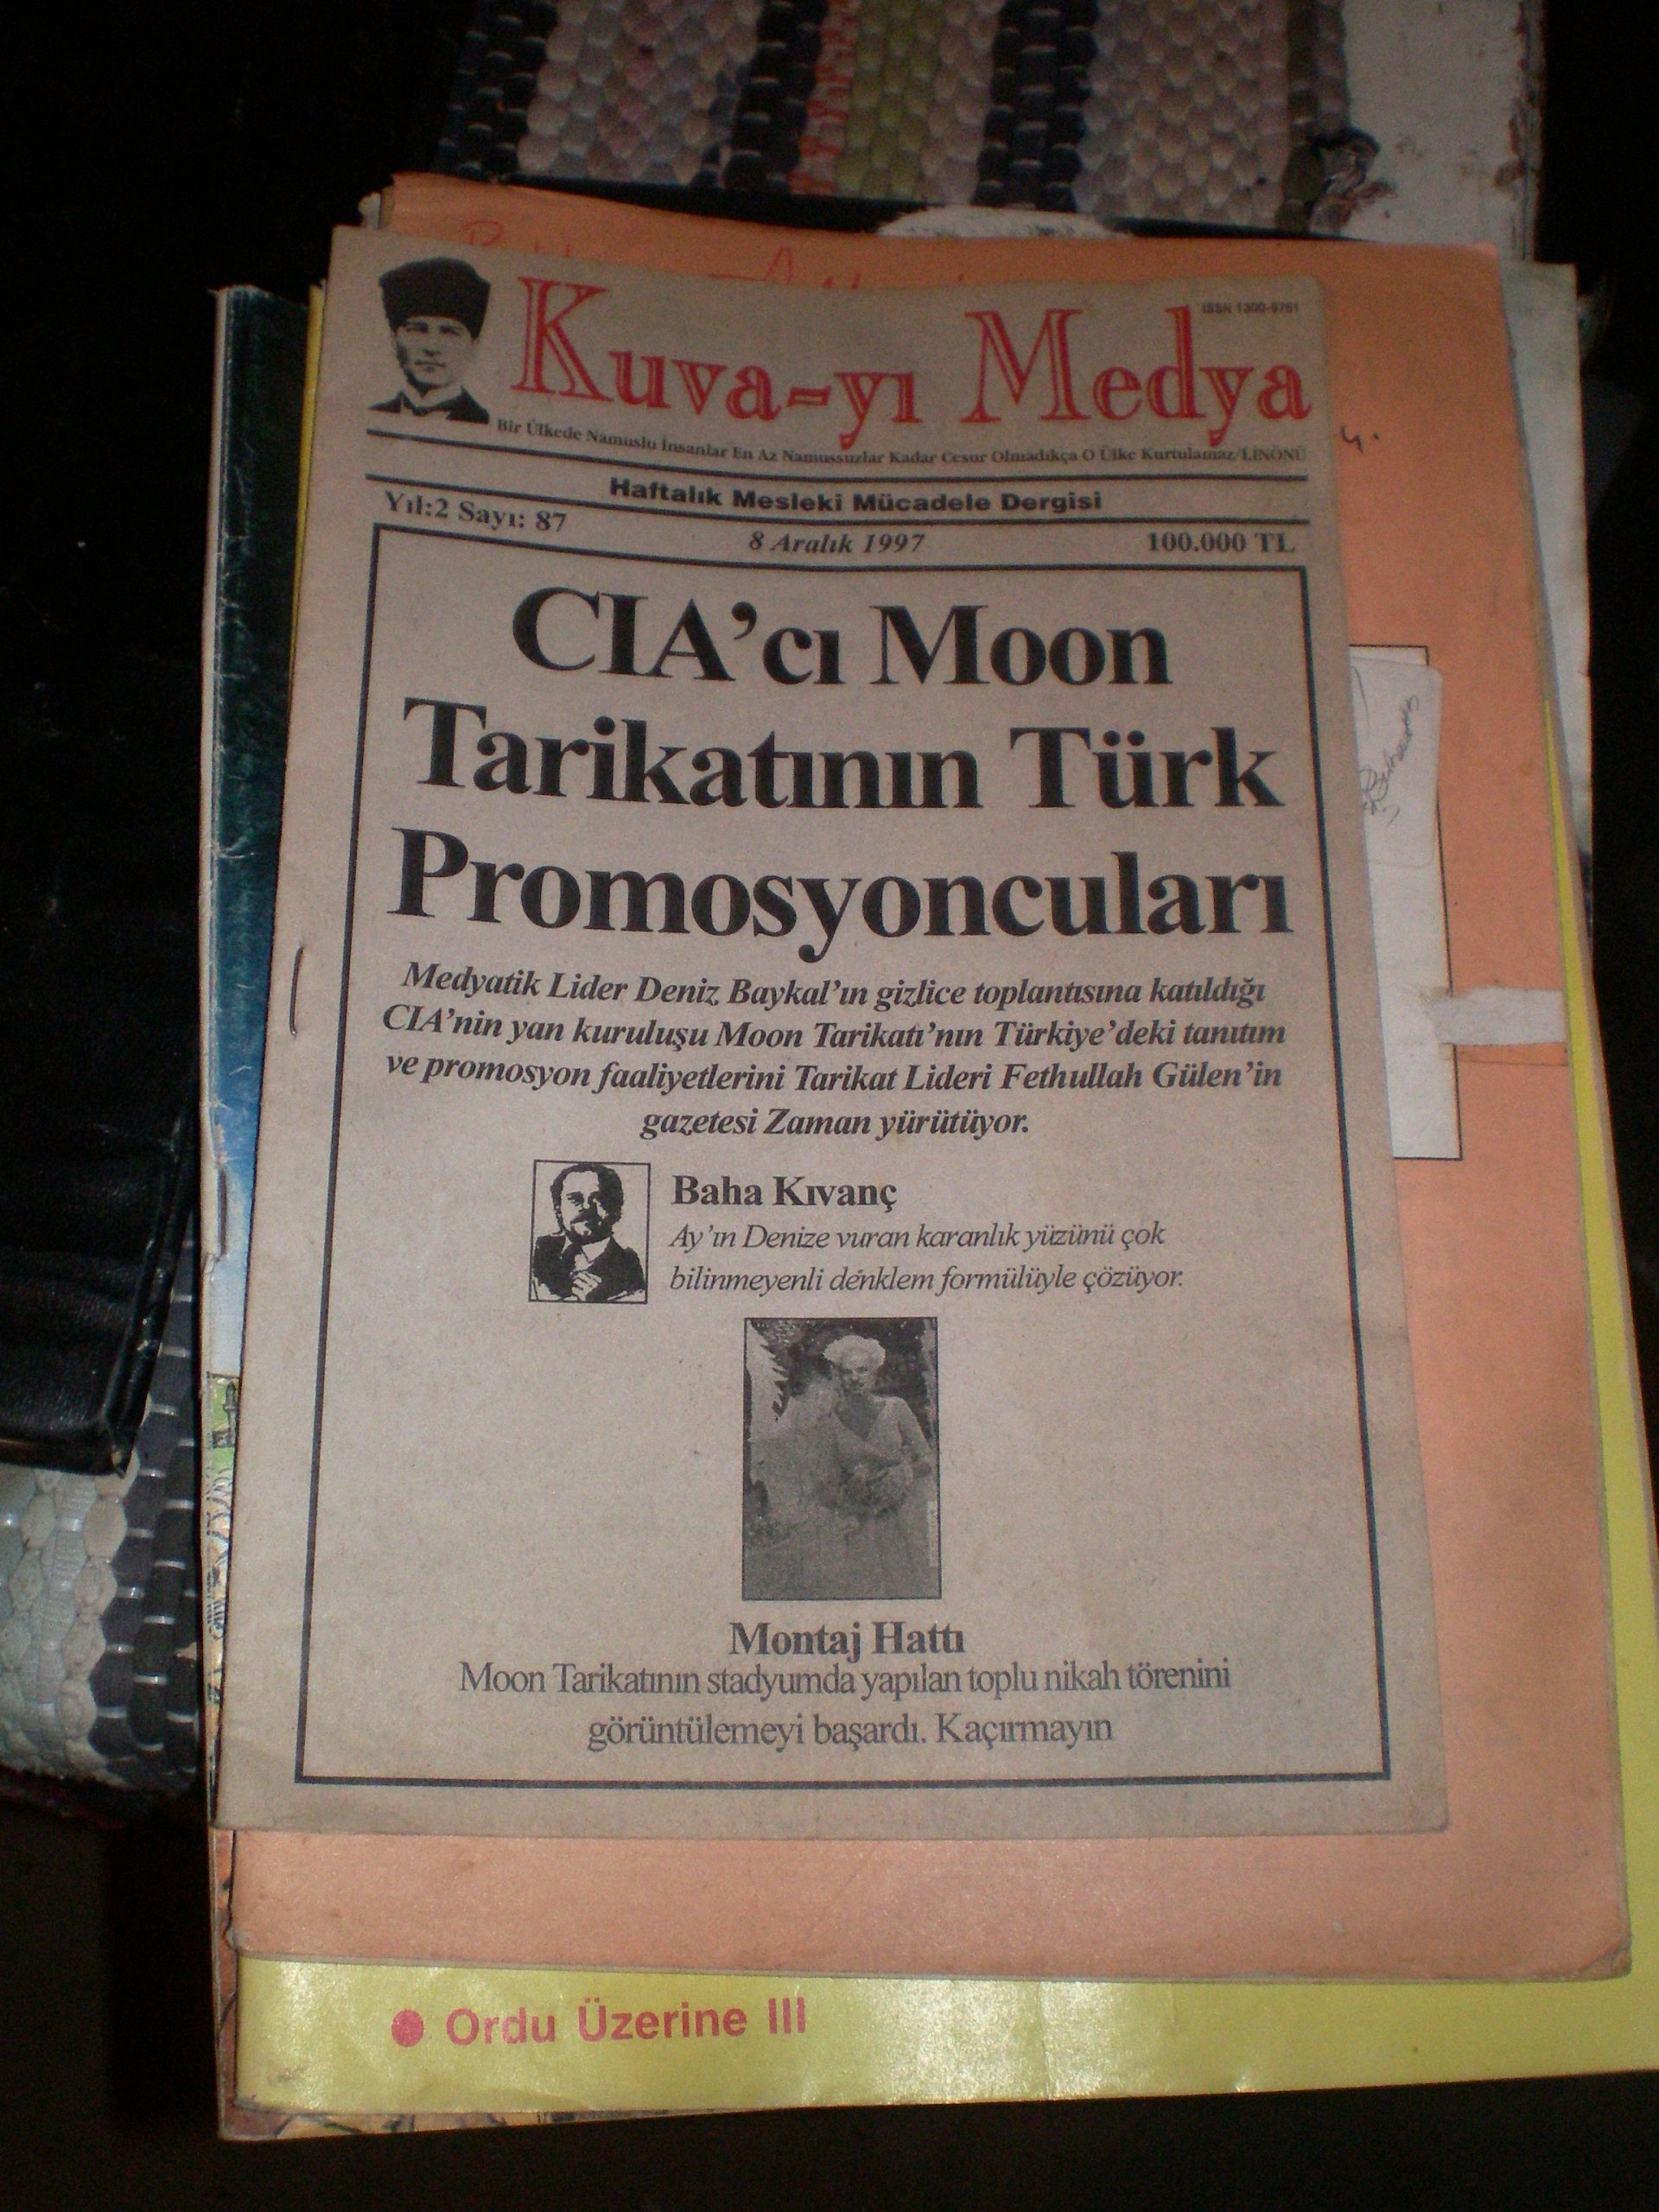 KUVA-YI MEDYA(8-aralık 1997) /5 tl